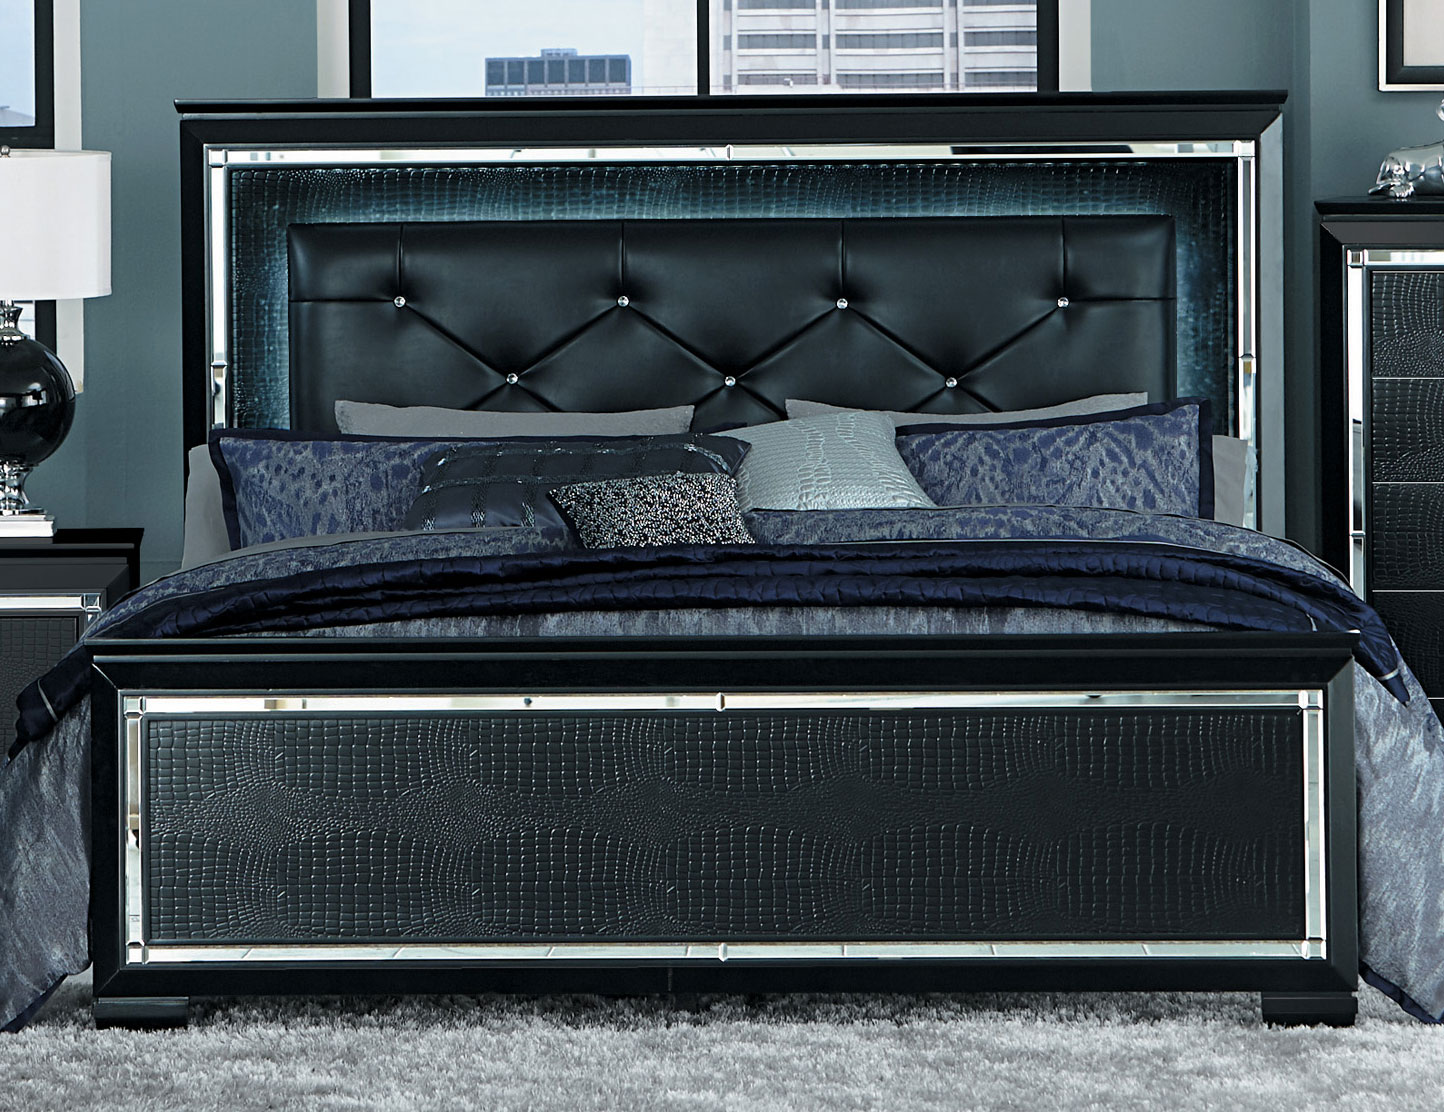 Homelegance Allura Bed with LED Lighting - Black